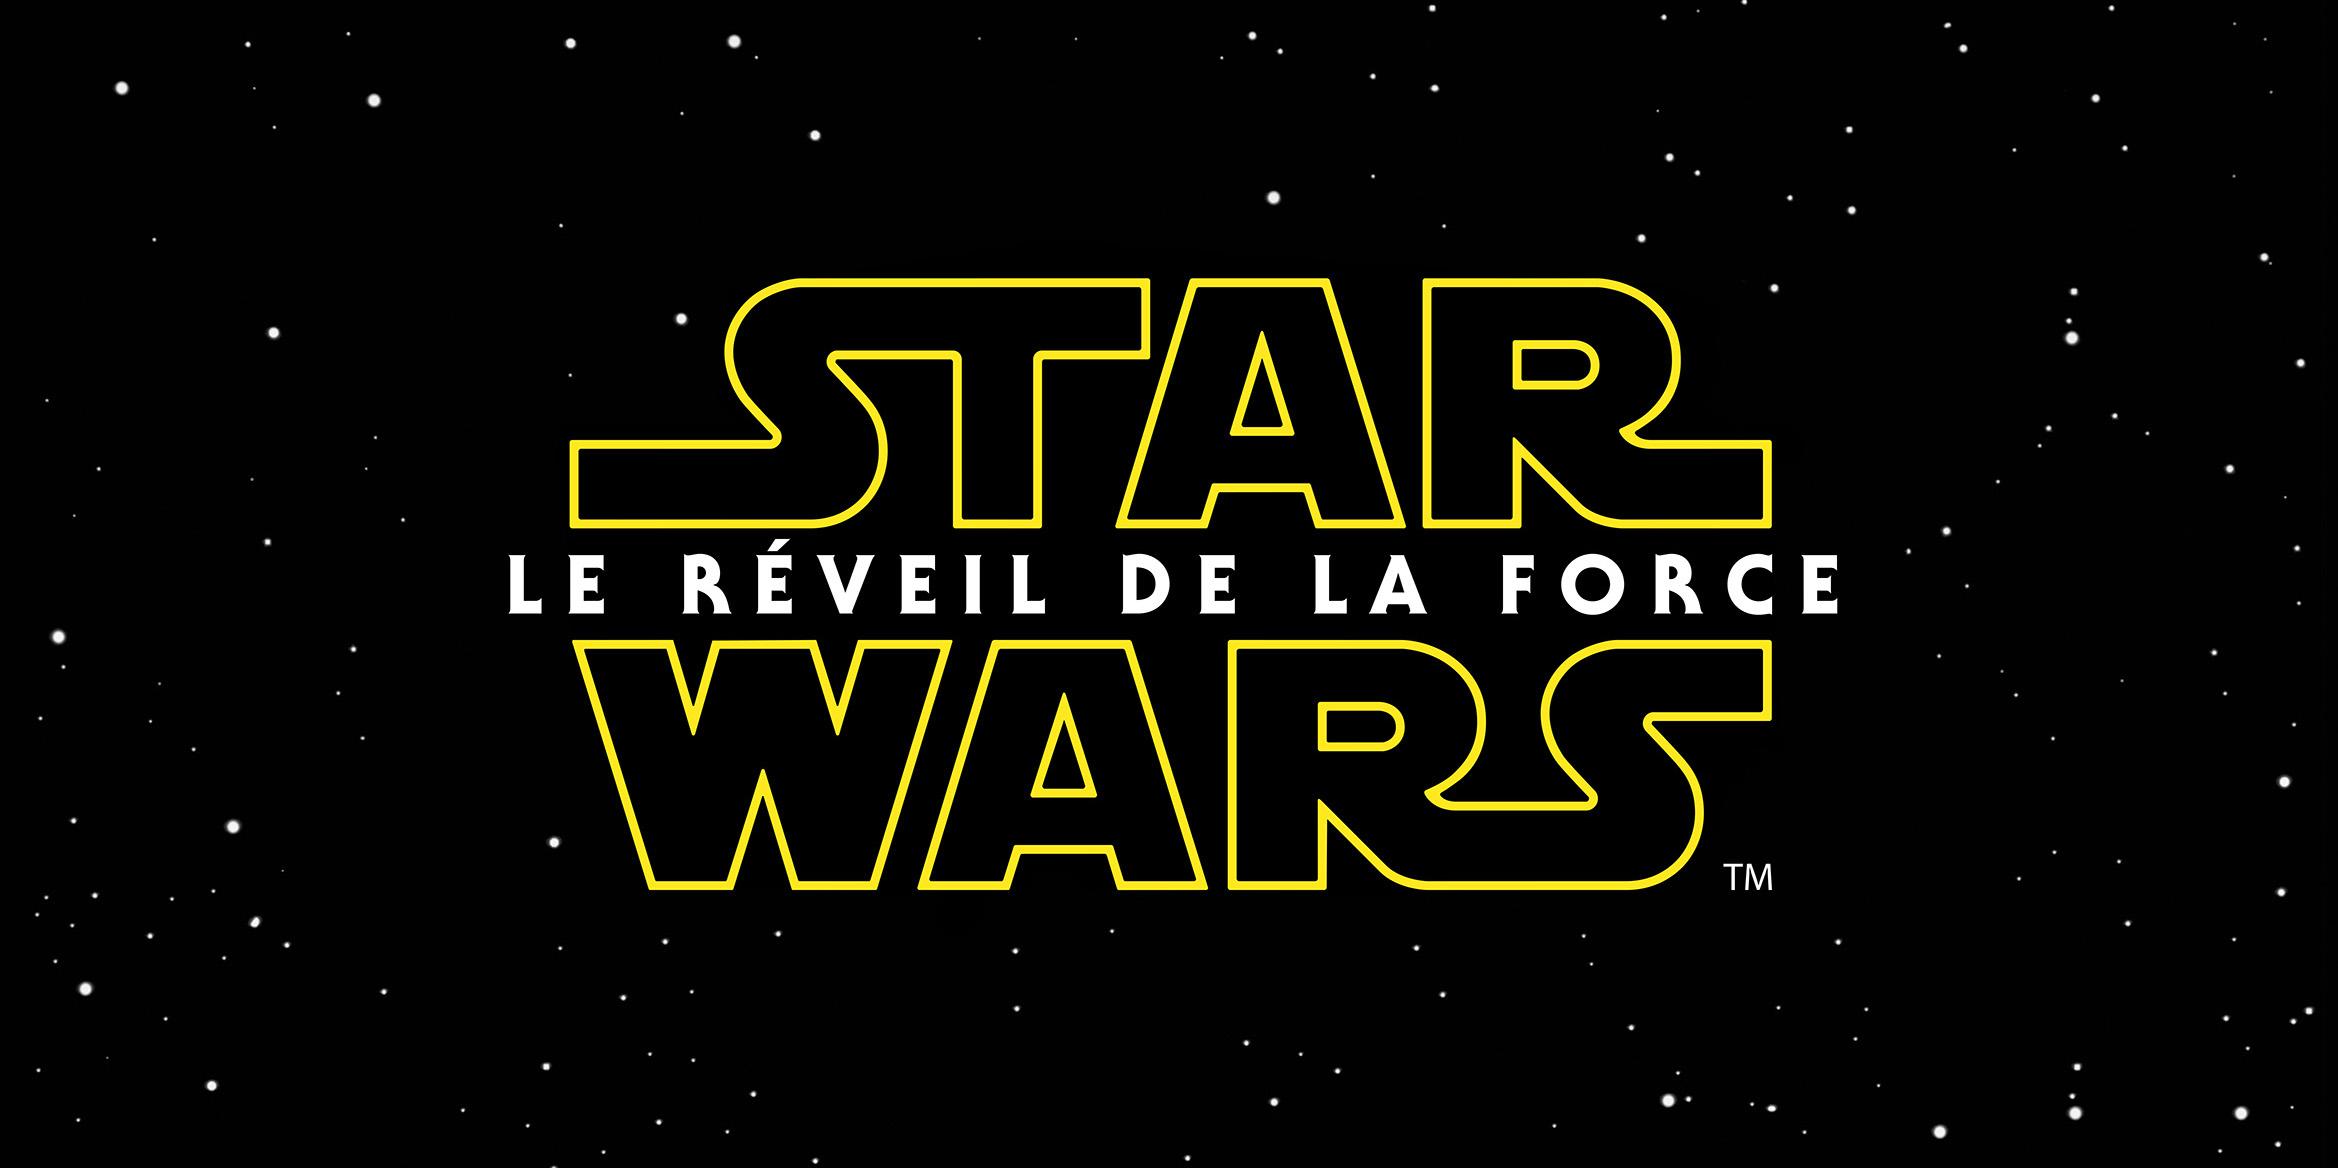 Disney-annonce-la-sortie-de-Star-Wars-VII-dans-100-jours